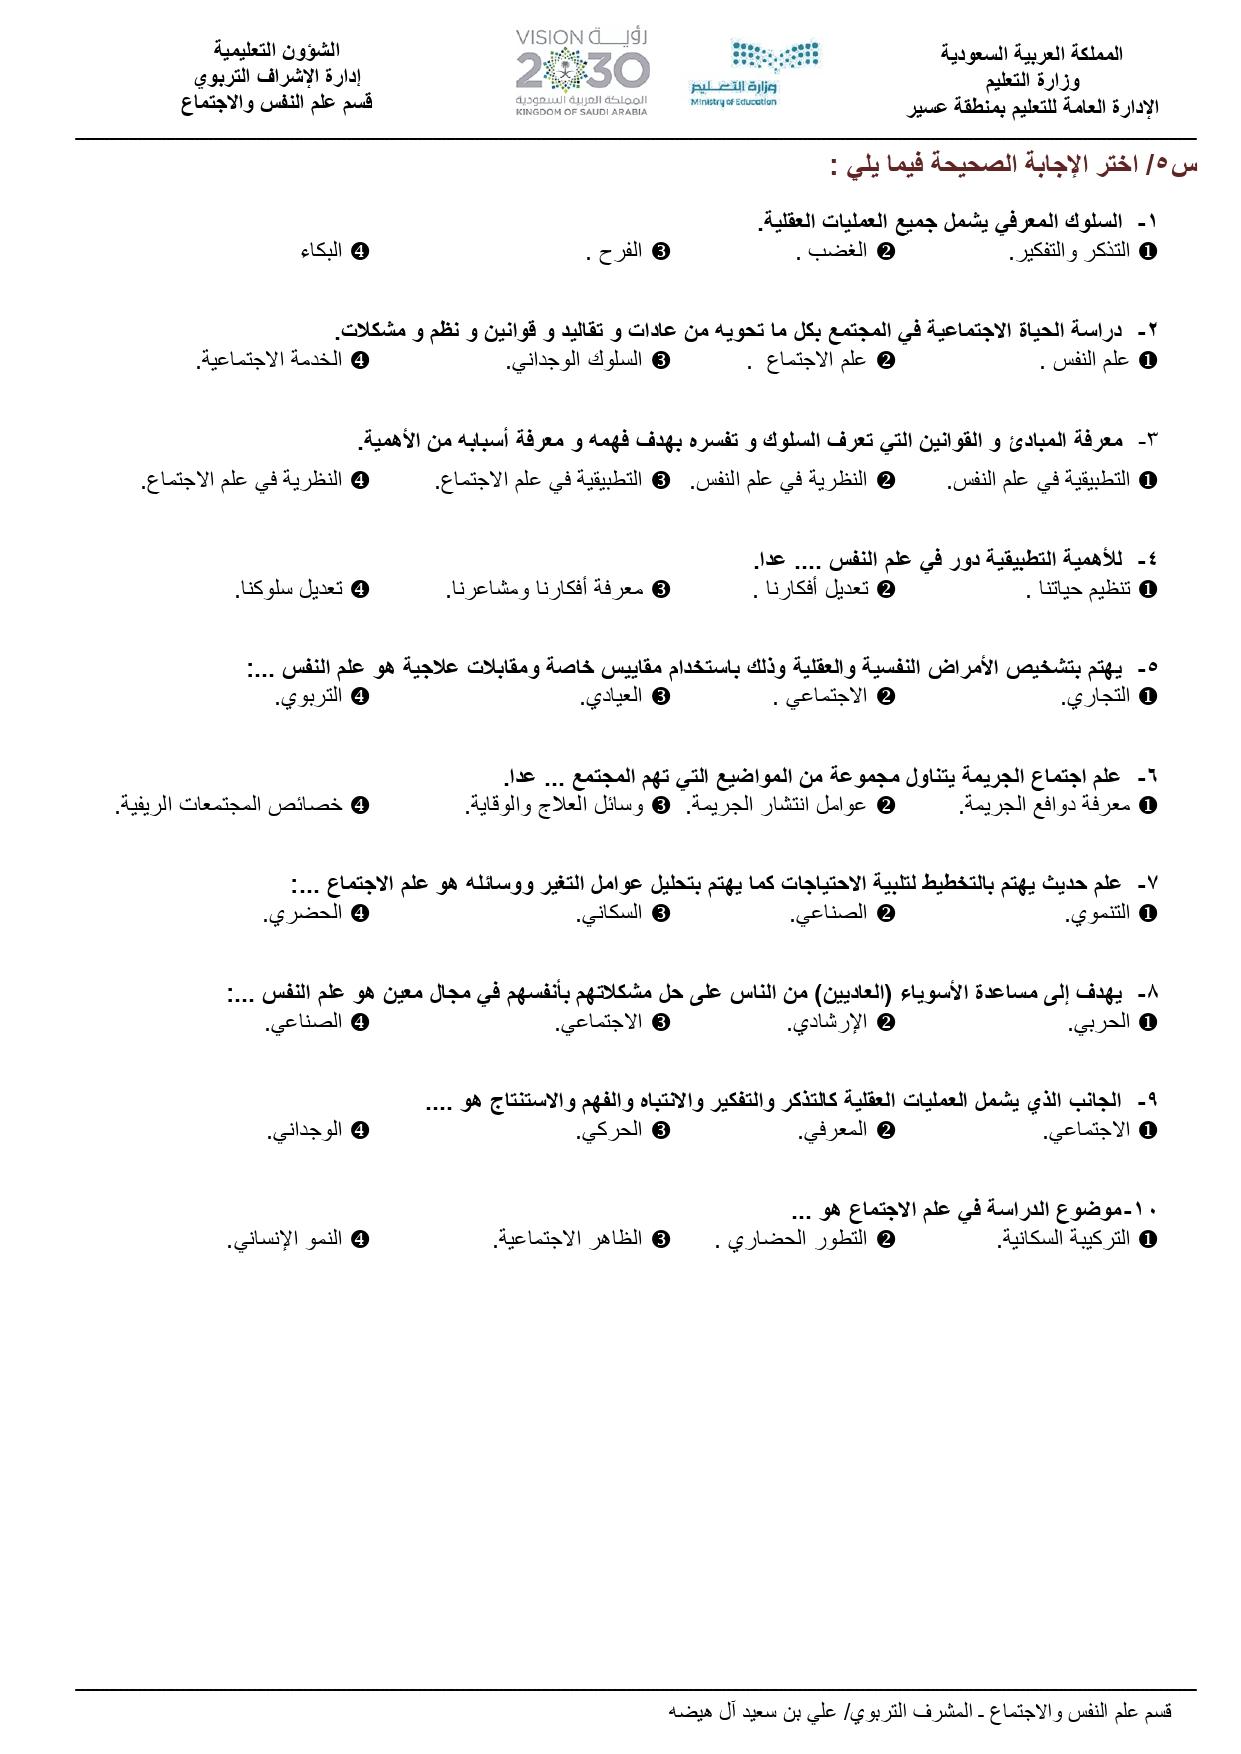 تقويم رقم 1 صفحة 2 Auauau12